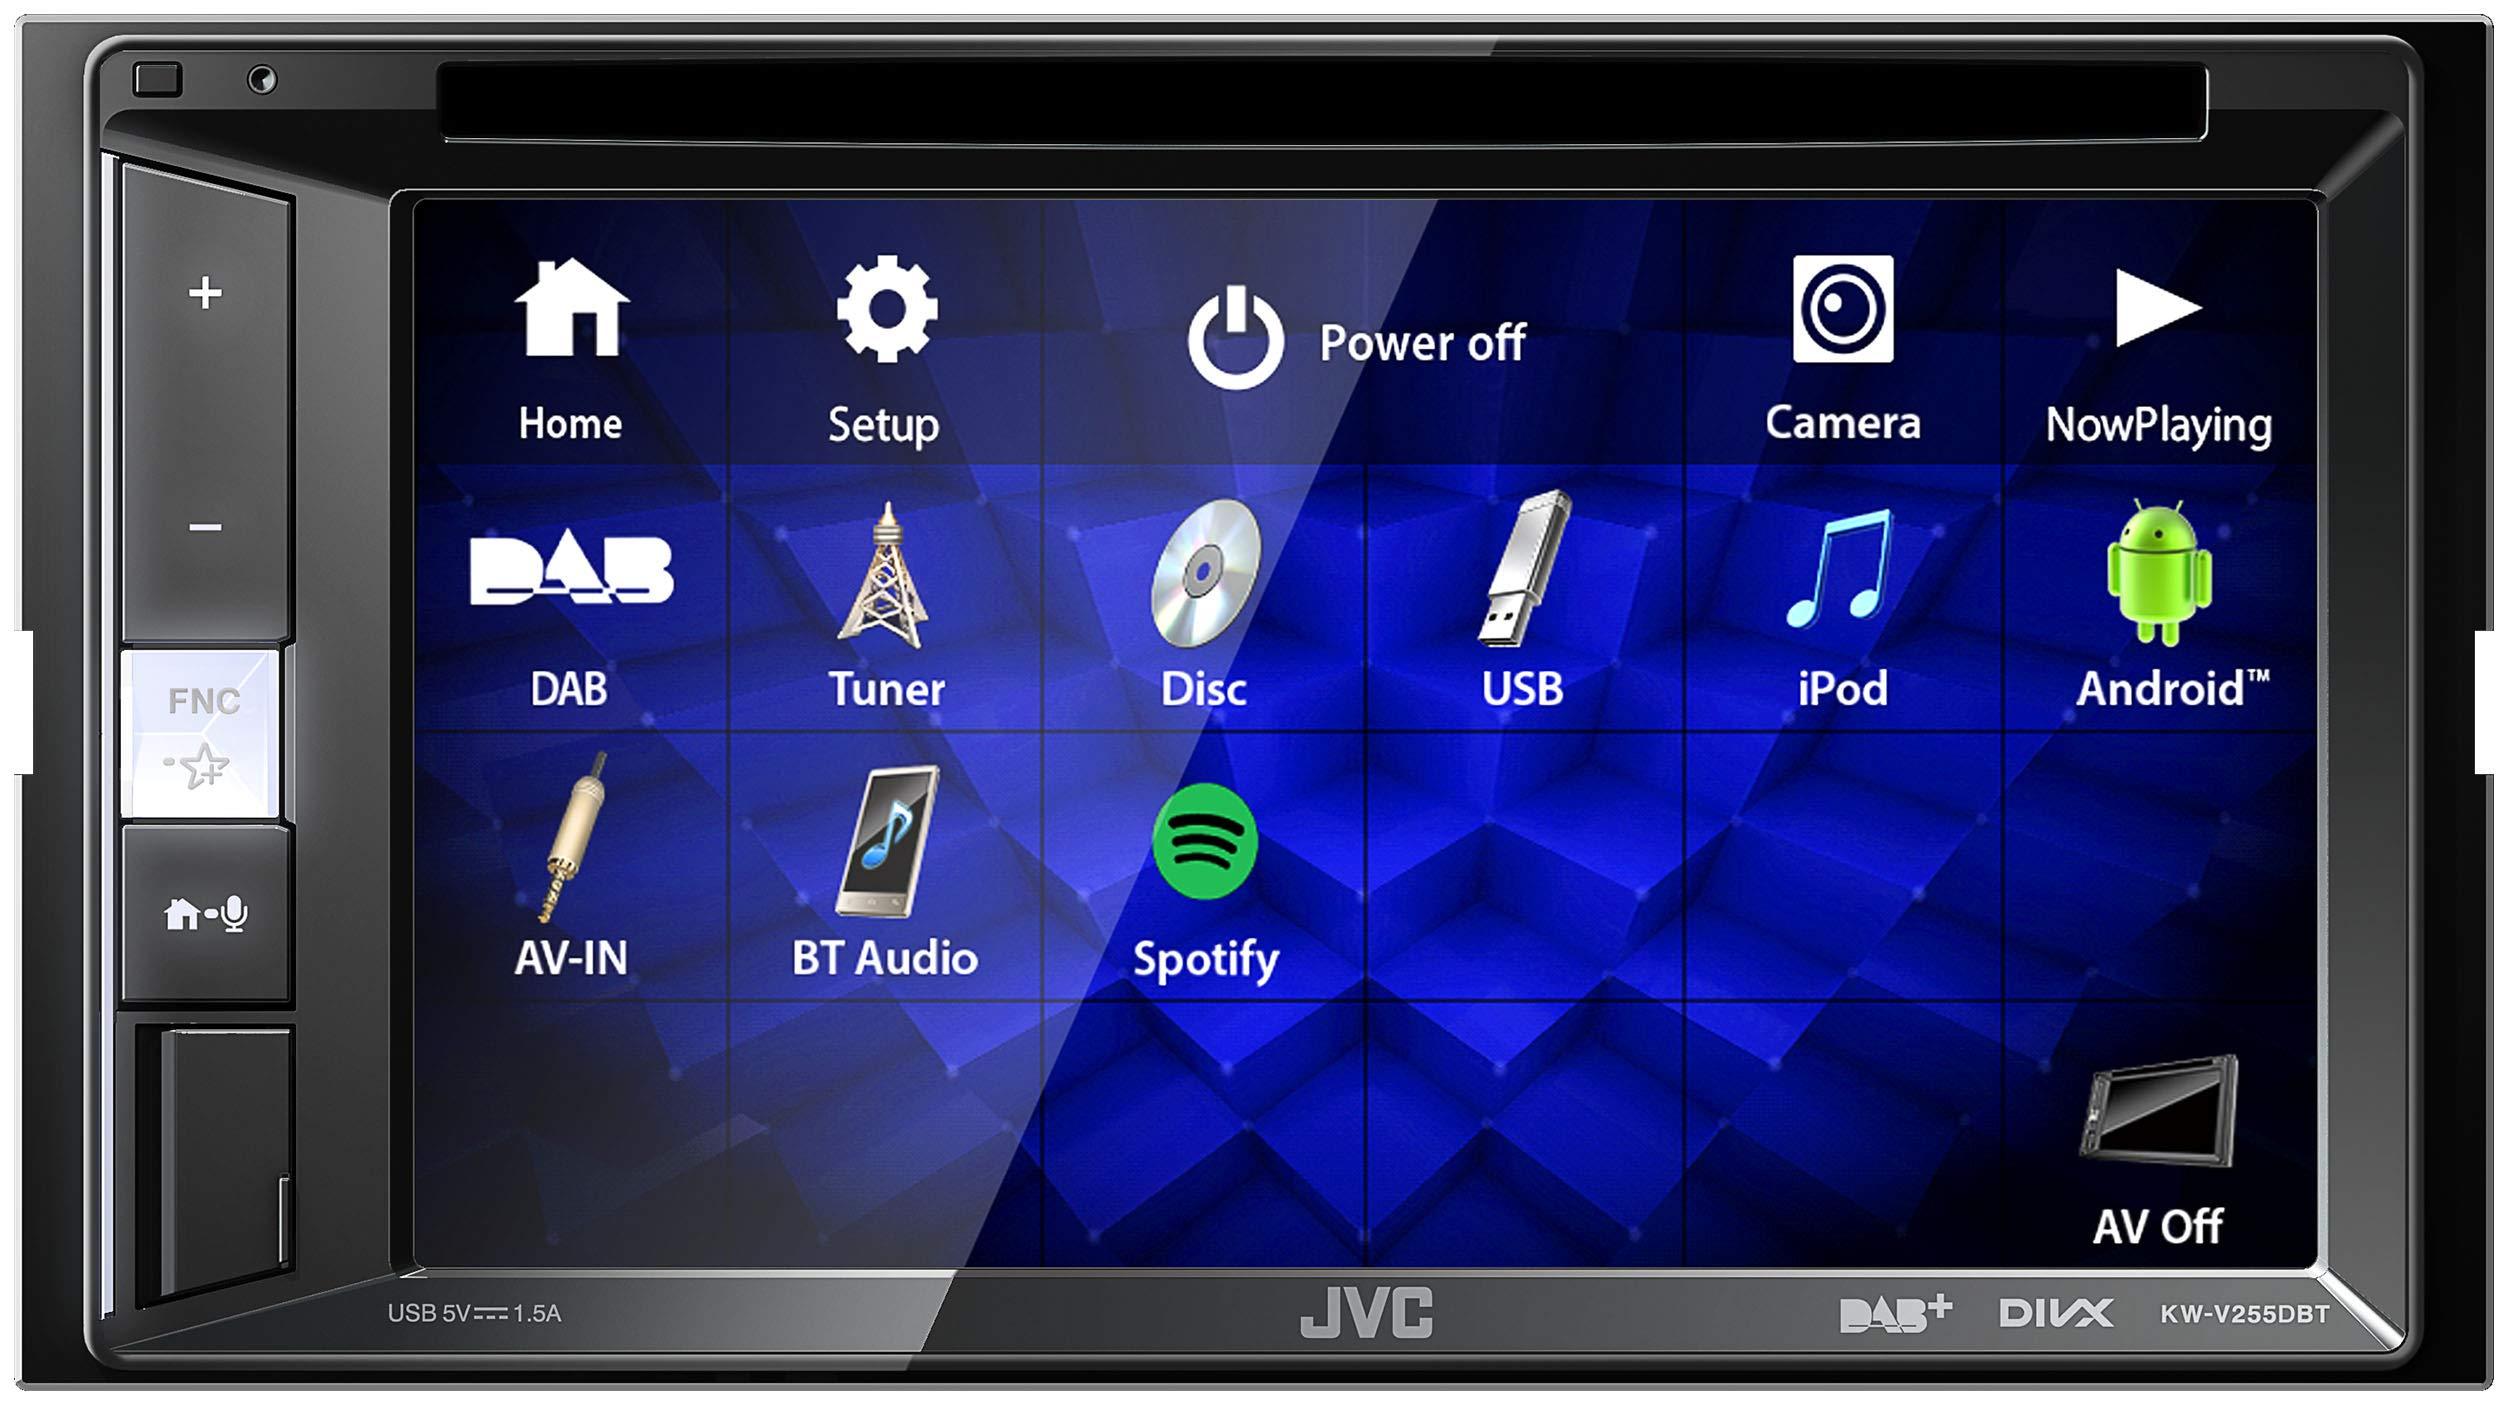 JVC-KW-V255DBT-DAB-Multimedia-Autoradio-mit-157-cm-Touchscreen-2-DIN-DVD-Bluetooth-Freisprecheinrichtung-Soundprozessor-USB-Android-Spotify-Control-Schwarz